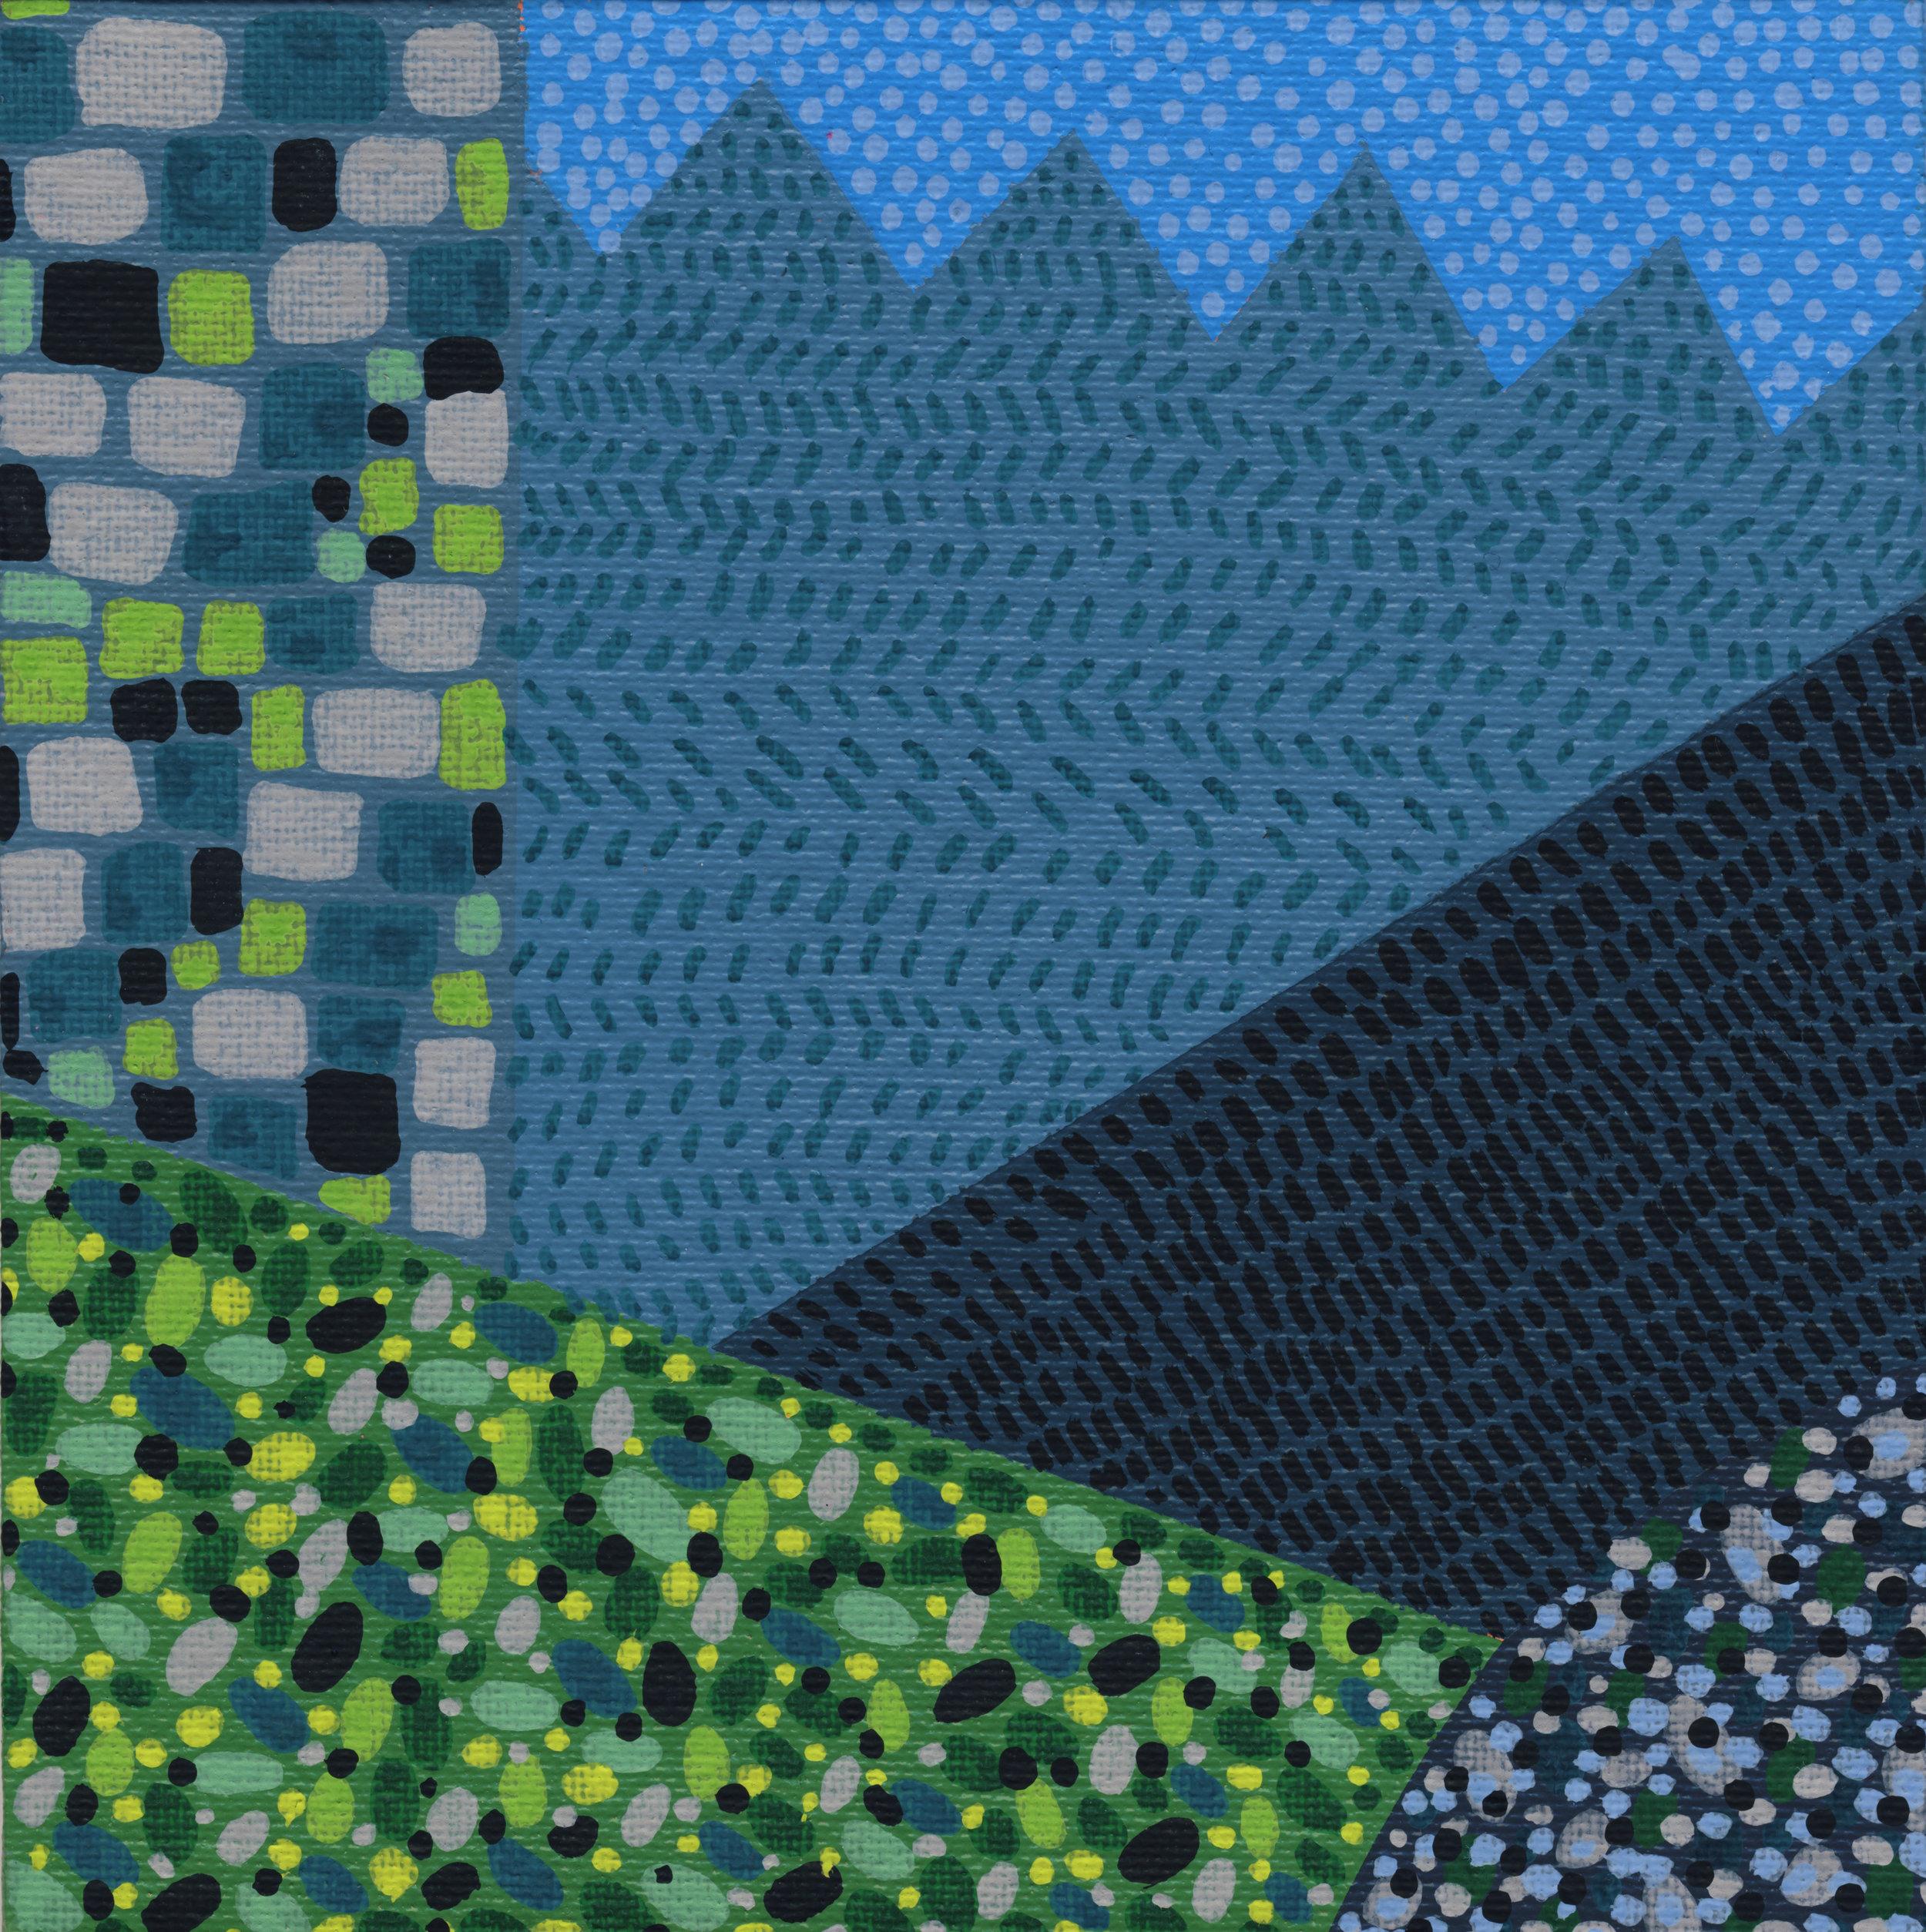 "38/100, Acrylic on canvas panel, 6"" X 6"", 2/13/19"